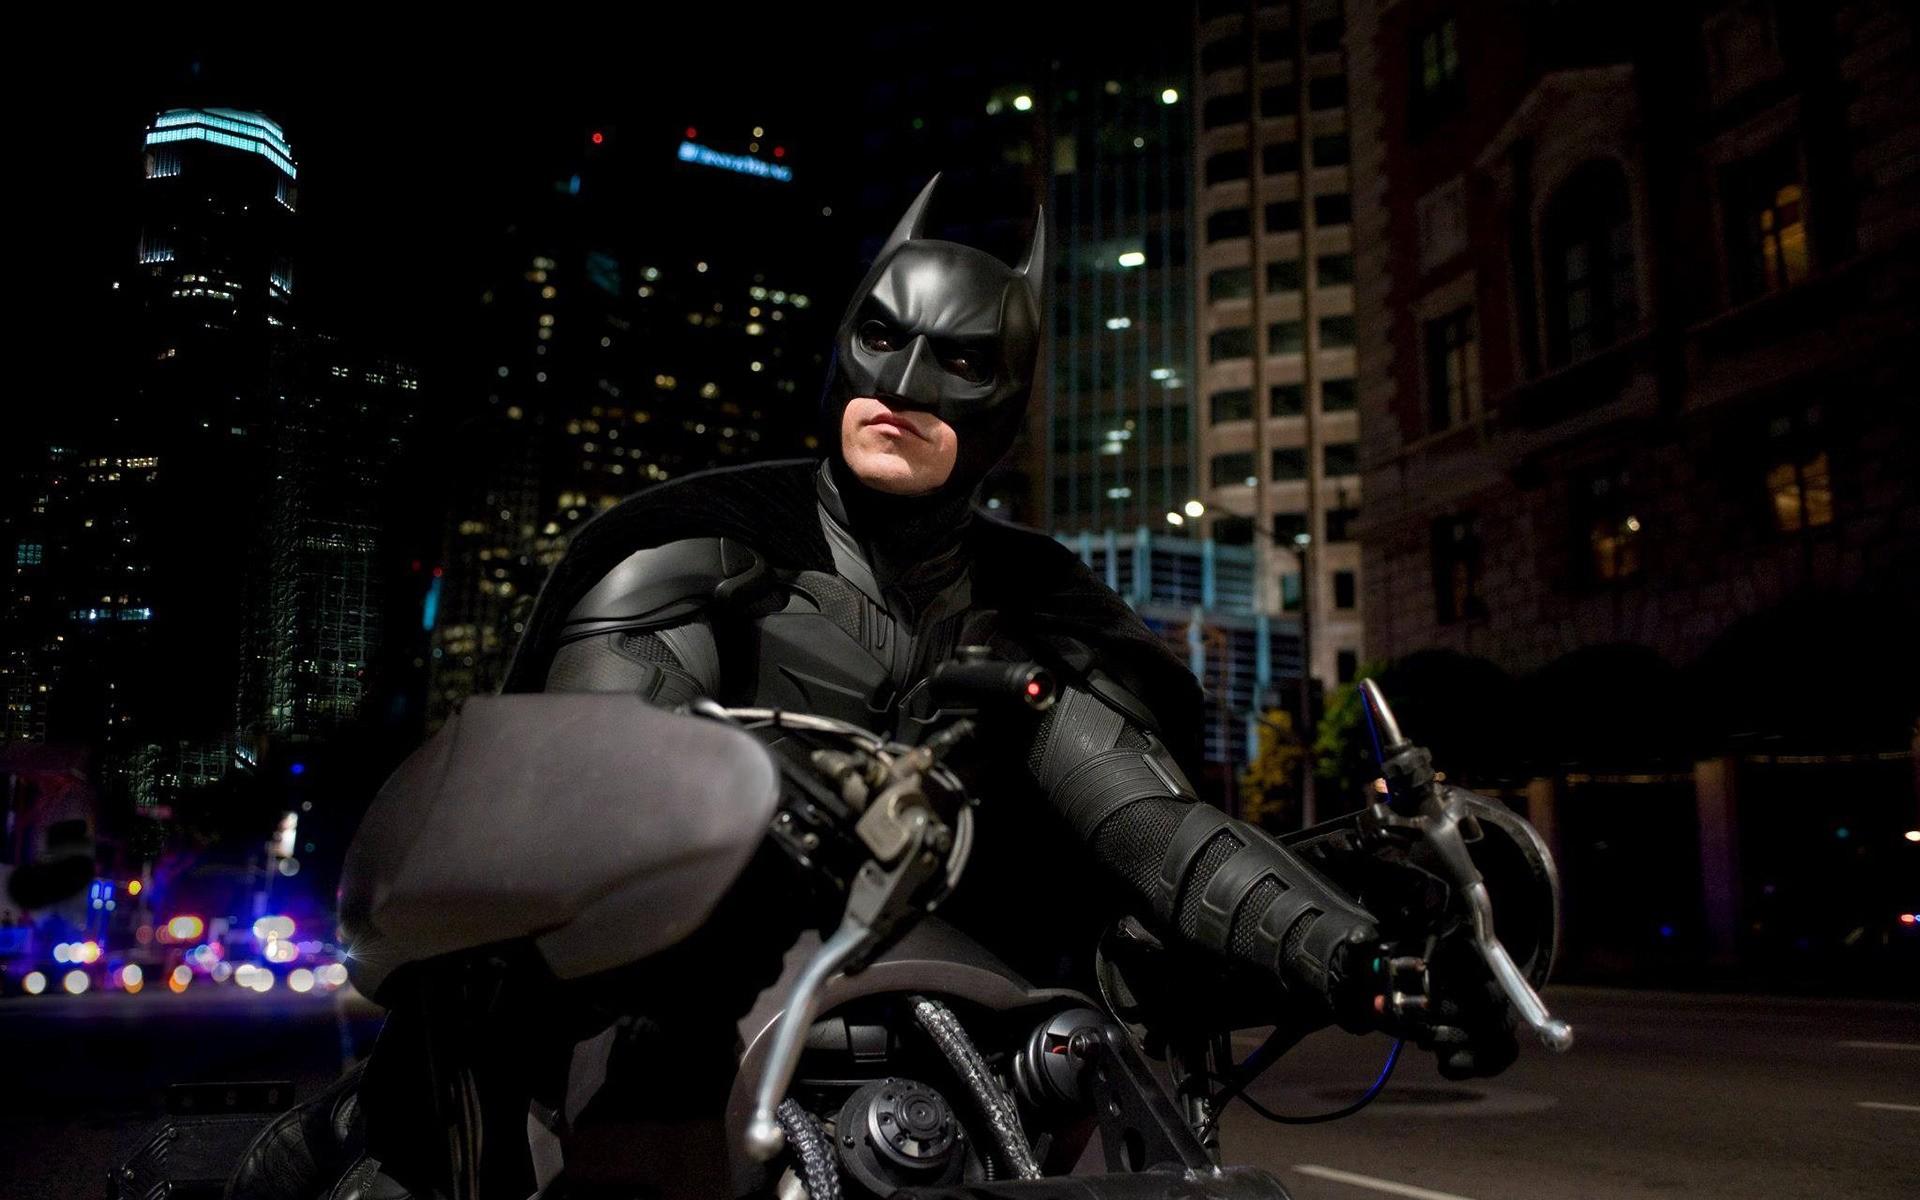 batman bike wallpaper for android reviewwallsco